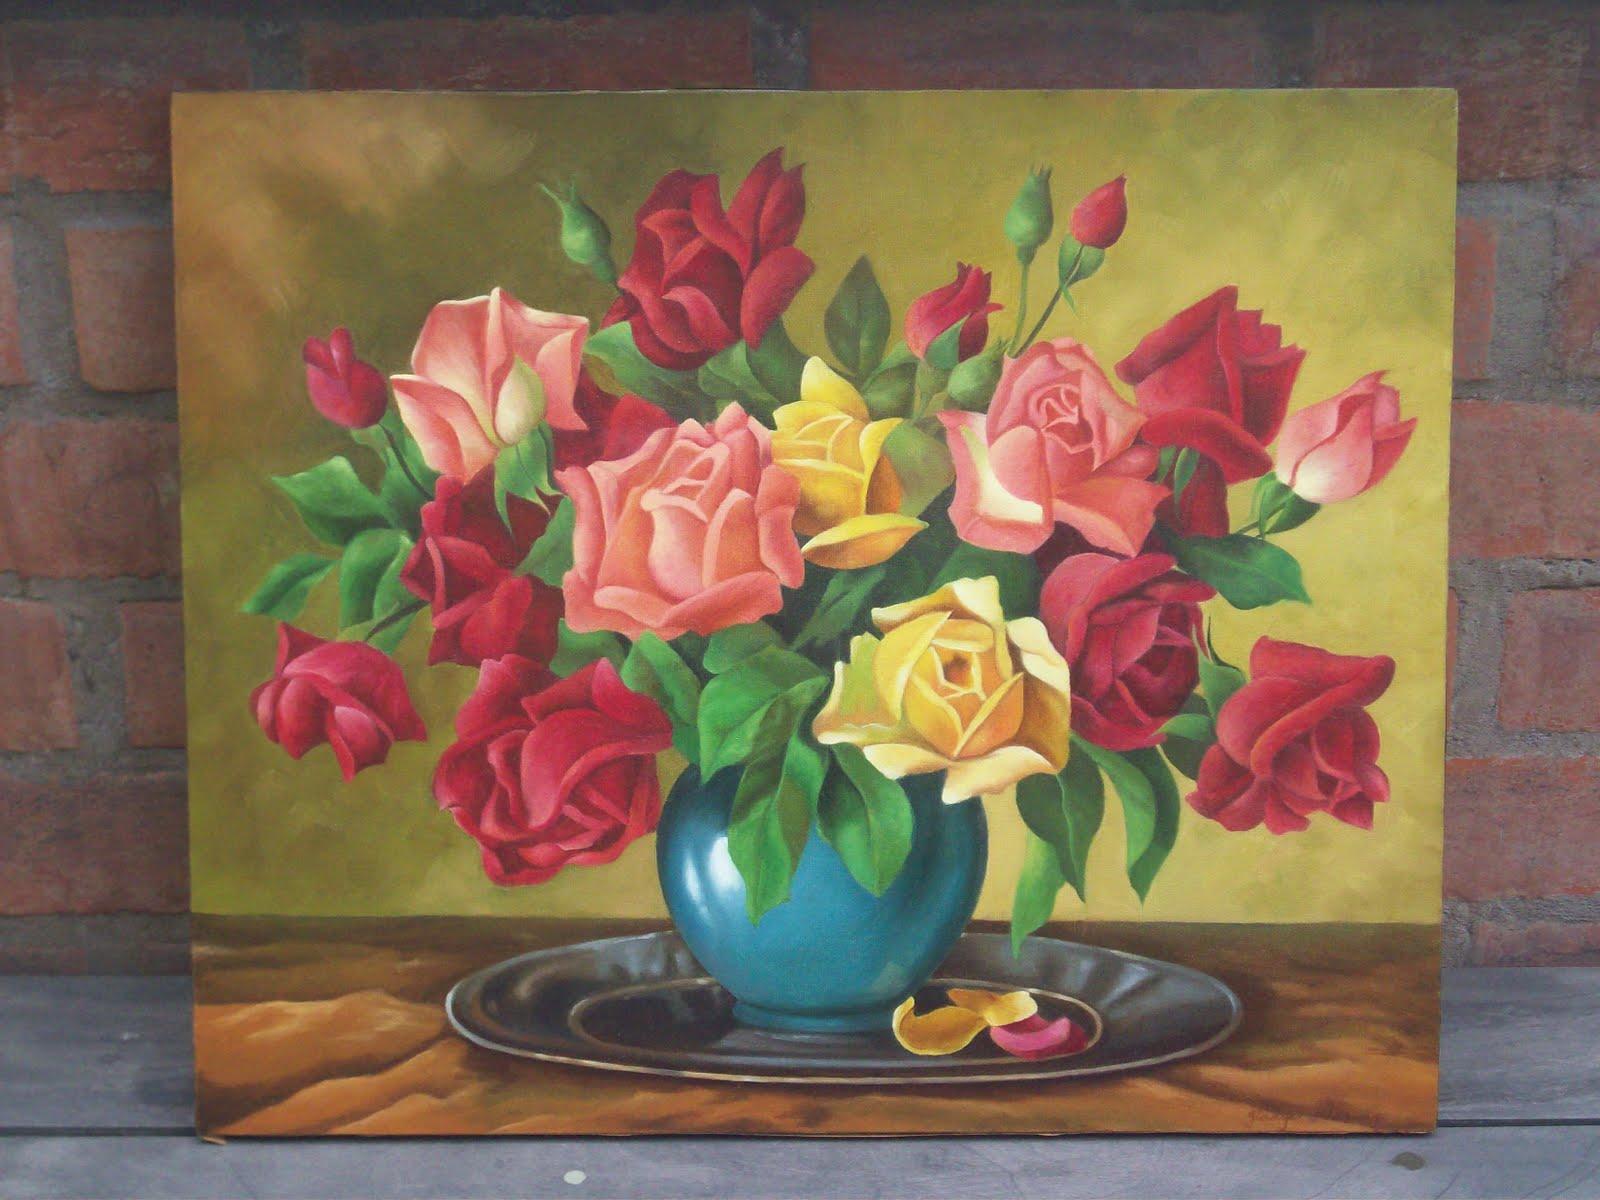 Manualidades pintar cuadros al oleo - Ideas para pintar cuadros ...